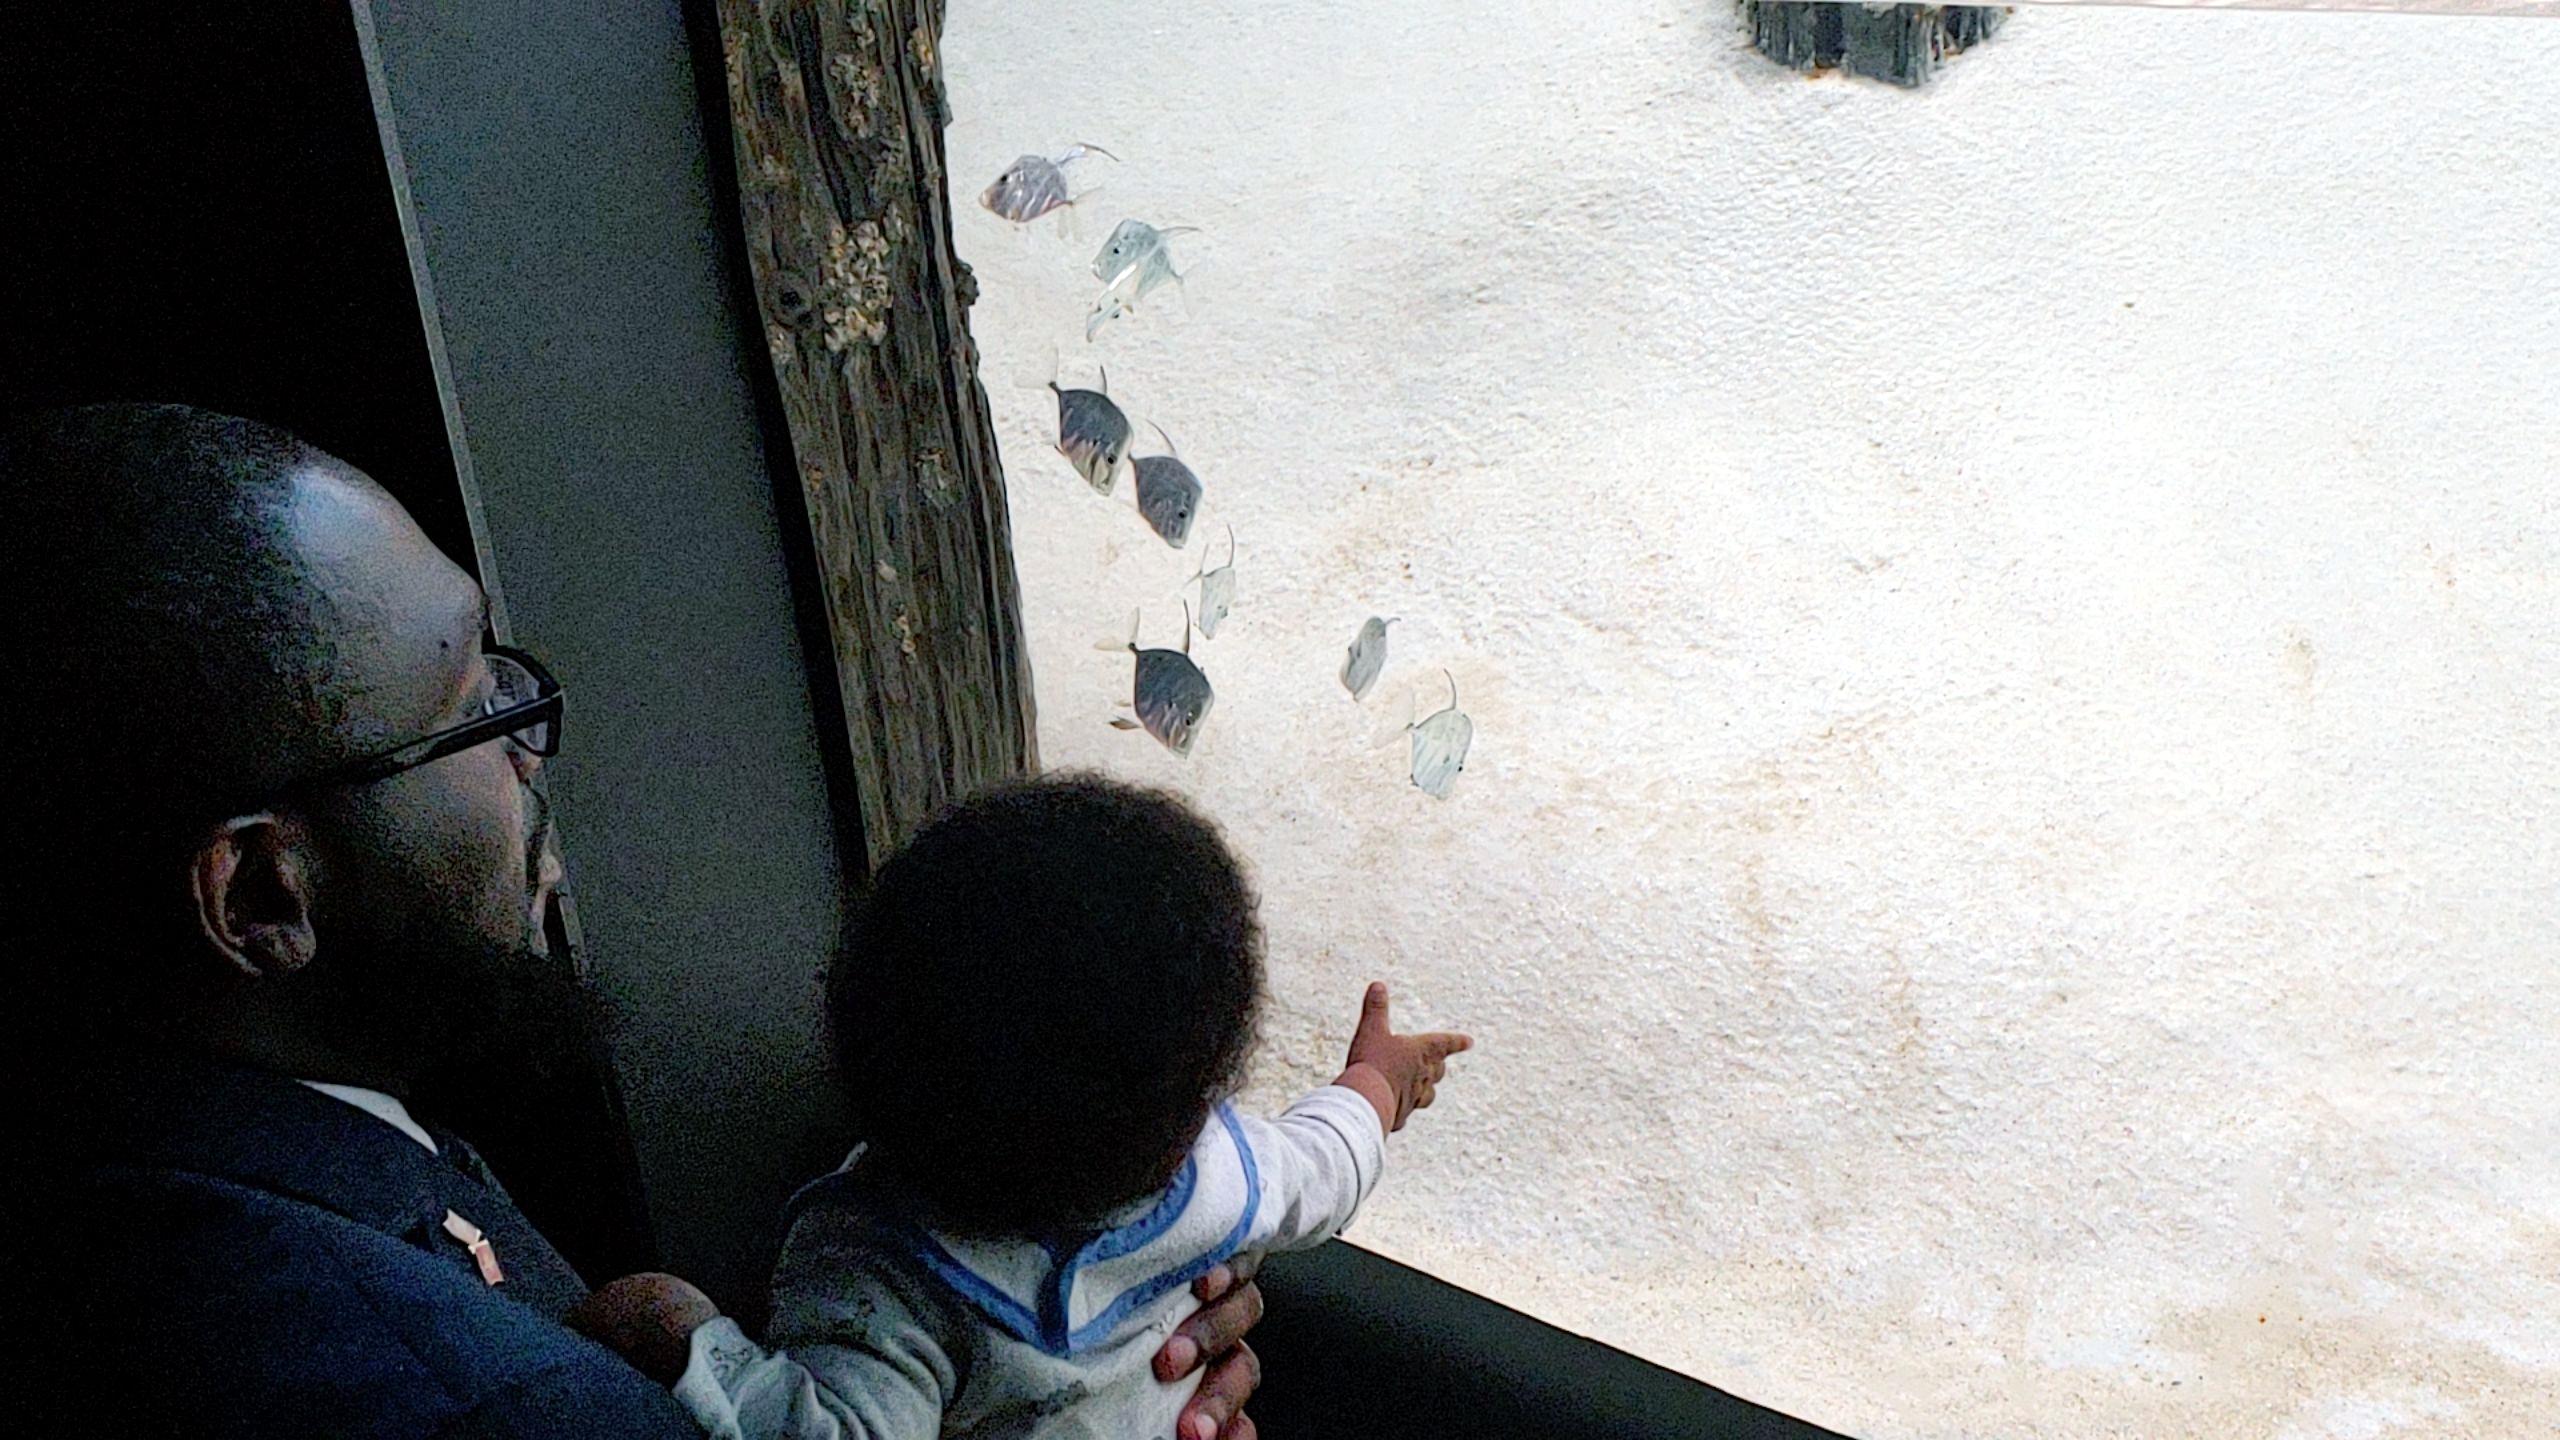 Living Our Dreams - Baltimore National Aquarium